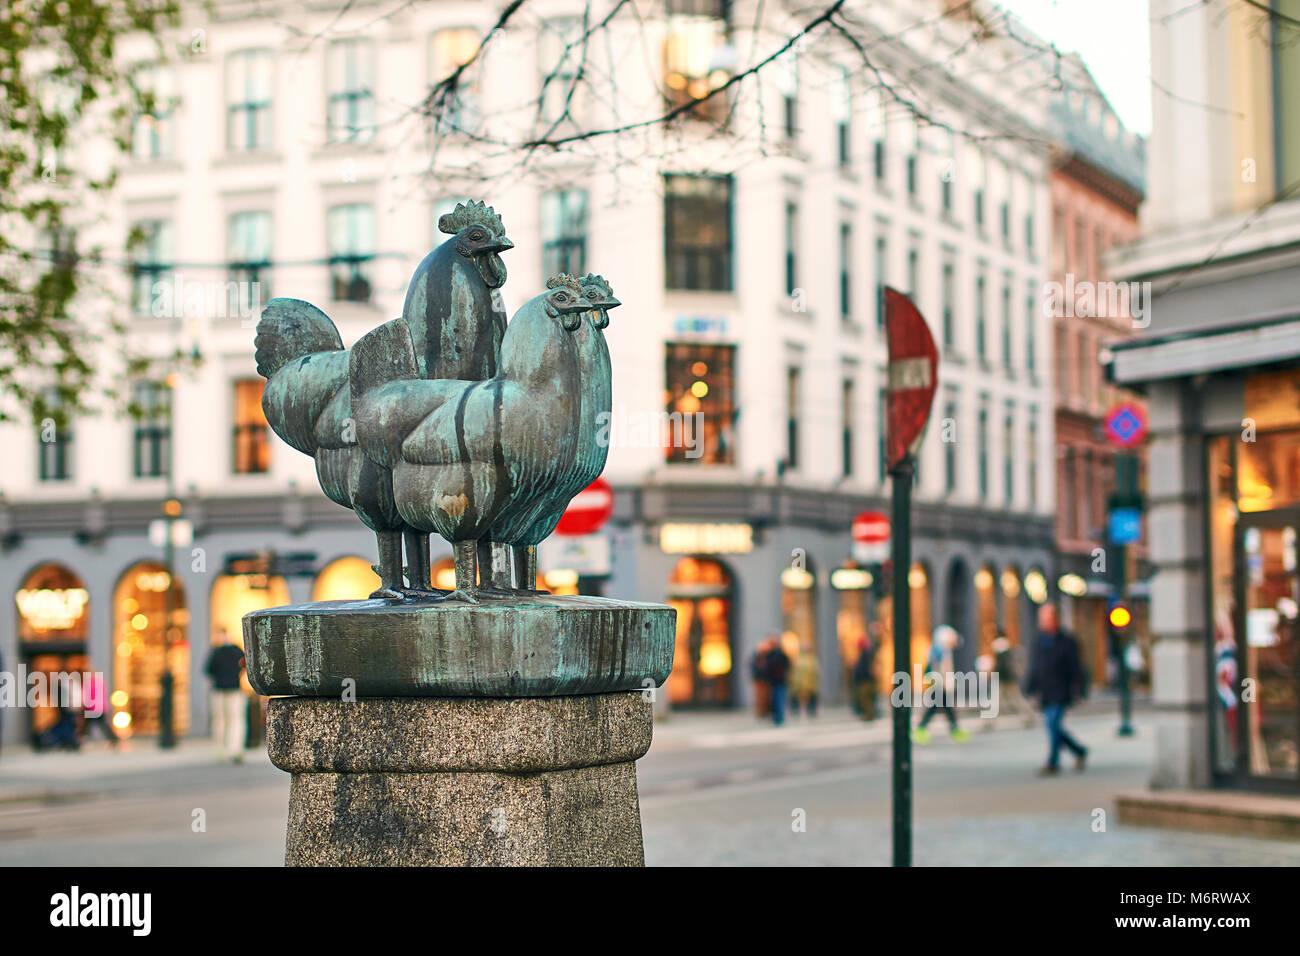 The Dyrefontene or Pet Fountain - sculpture of three checken or hens by Skule Waksvik. Landmark of Norwegian capital. Stock Photo